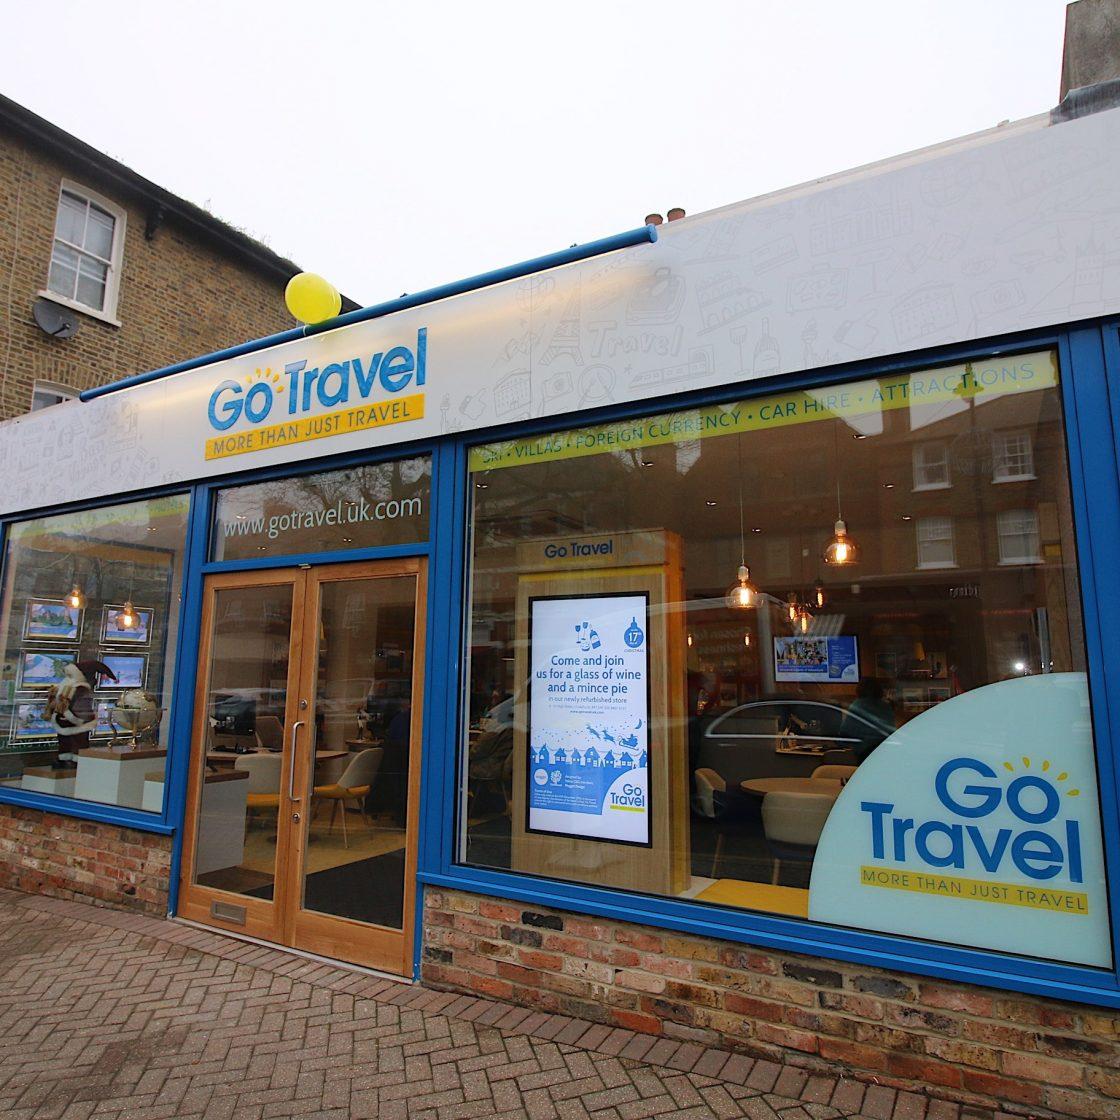 Go Travel_Chislhrust_Shopfront Interior Design By Nugget Design 01